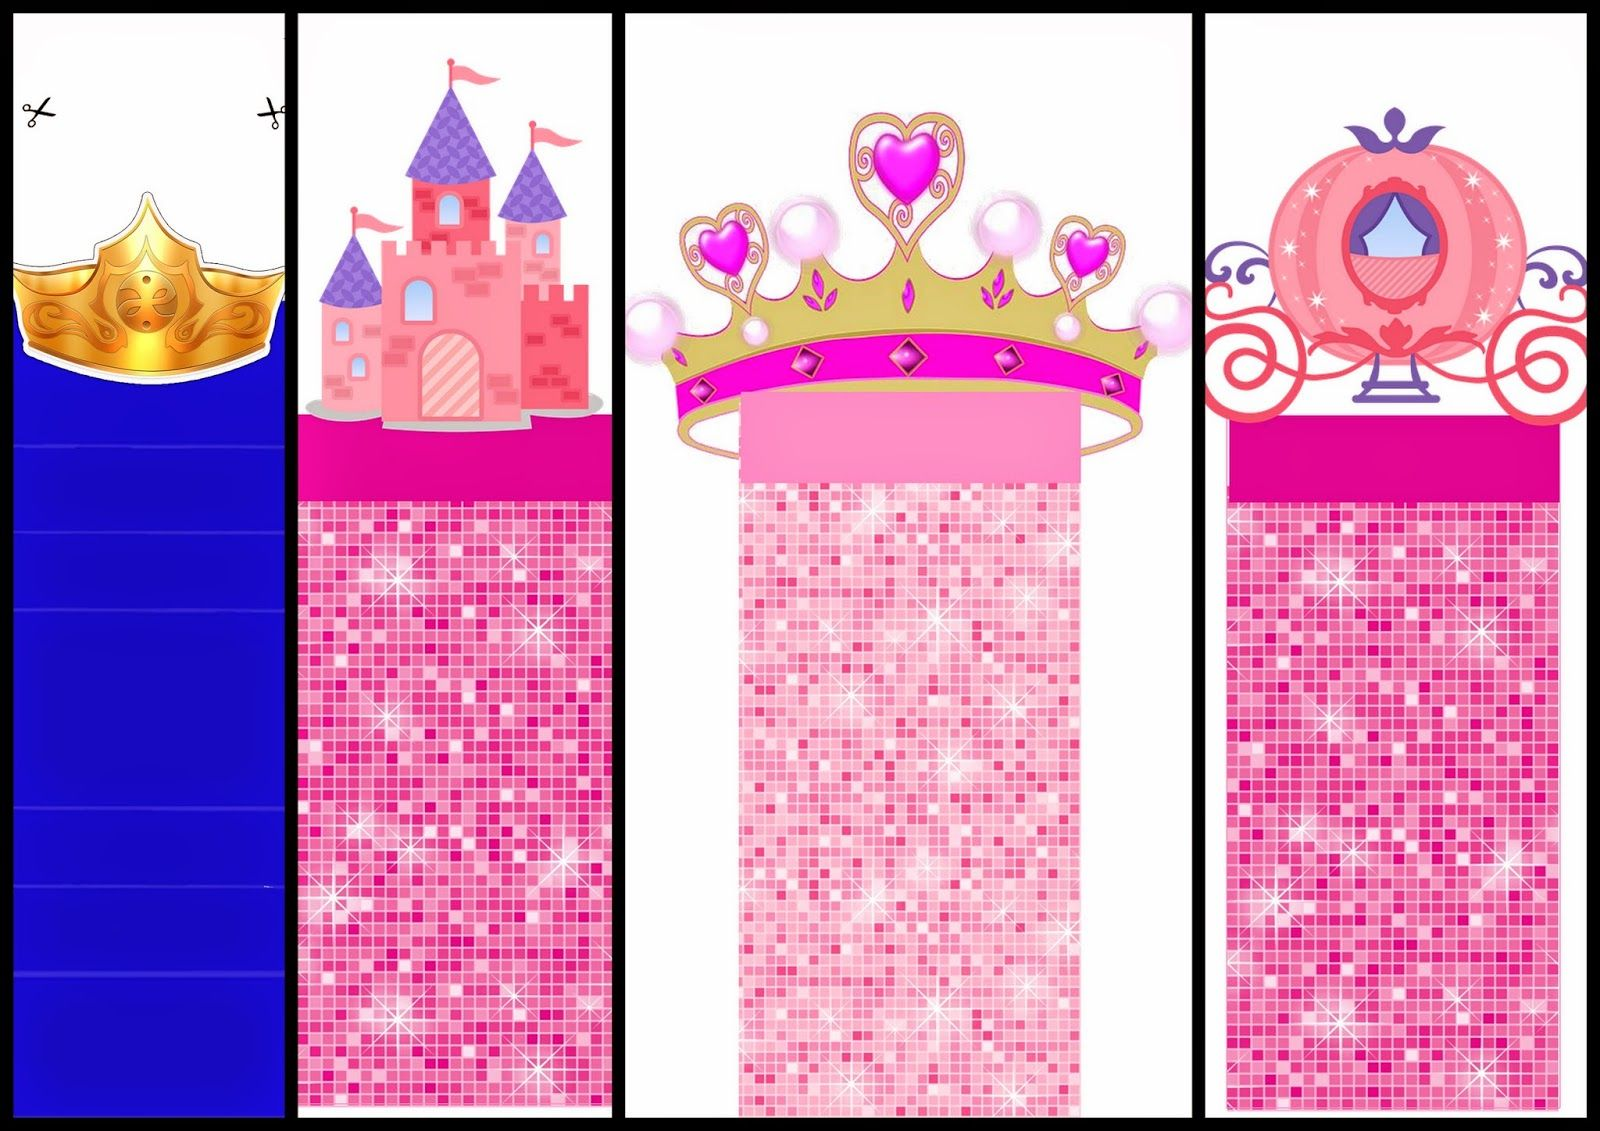 Oh My Fiesta In English Princess Free Printable Original Nuggets Wrappers Disney Princess Printables Princess Diy Princess Theme Party